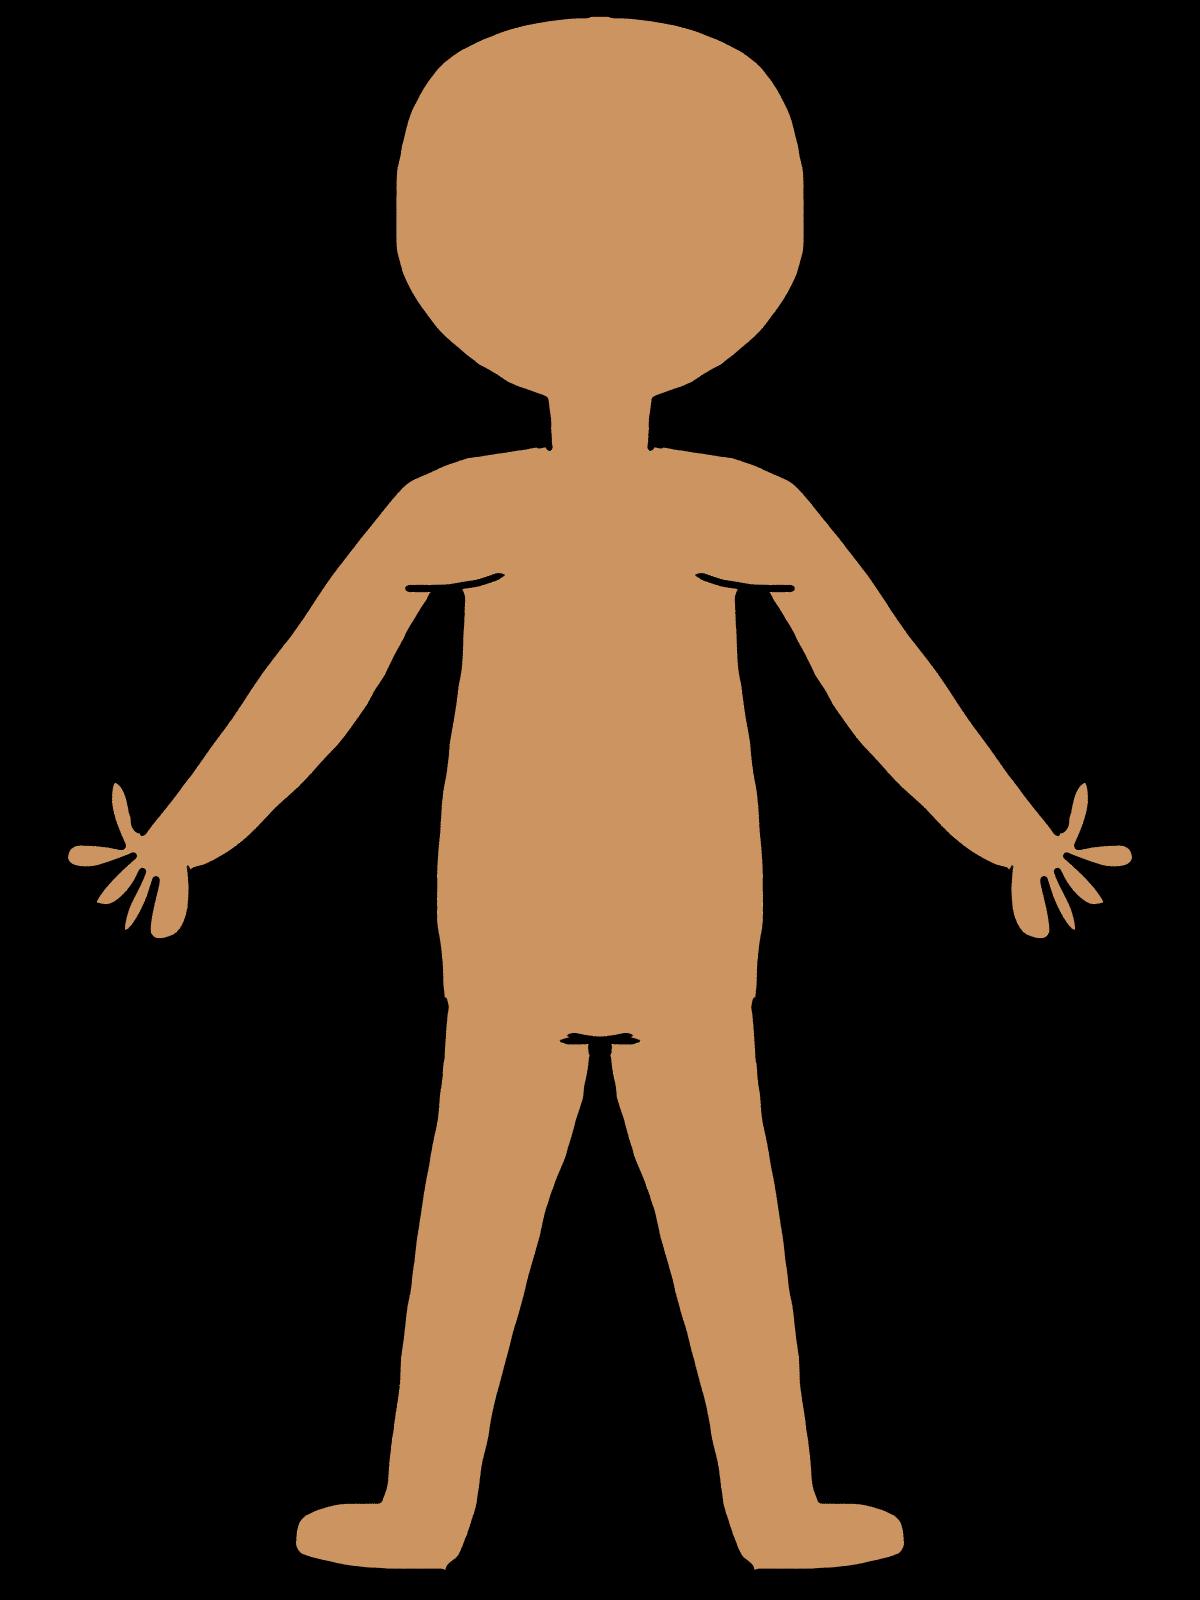 Anatomy clipart kid body Download Download Human #11 Human